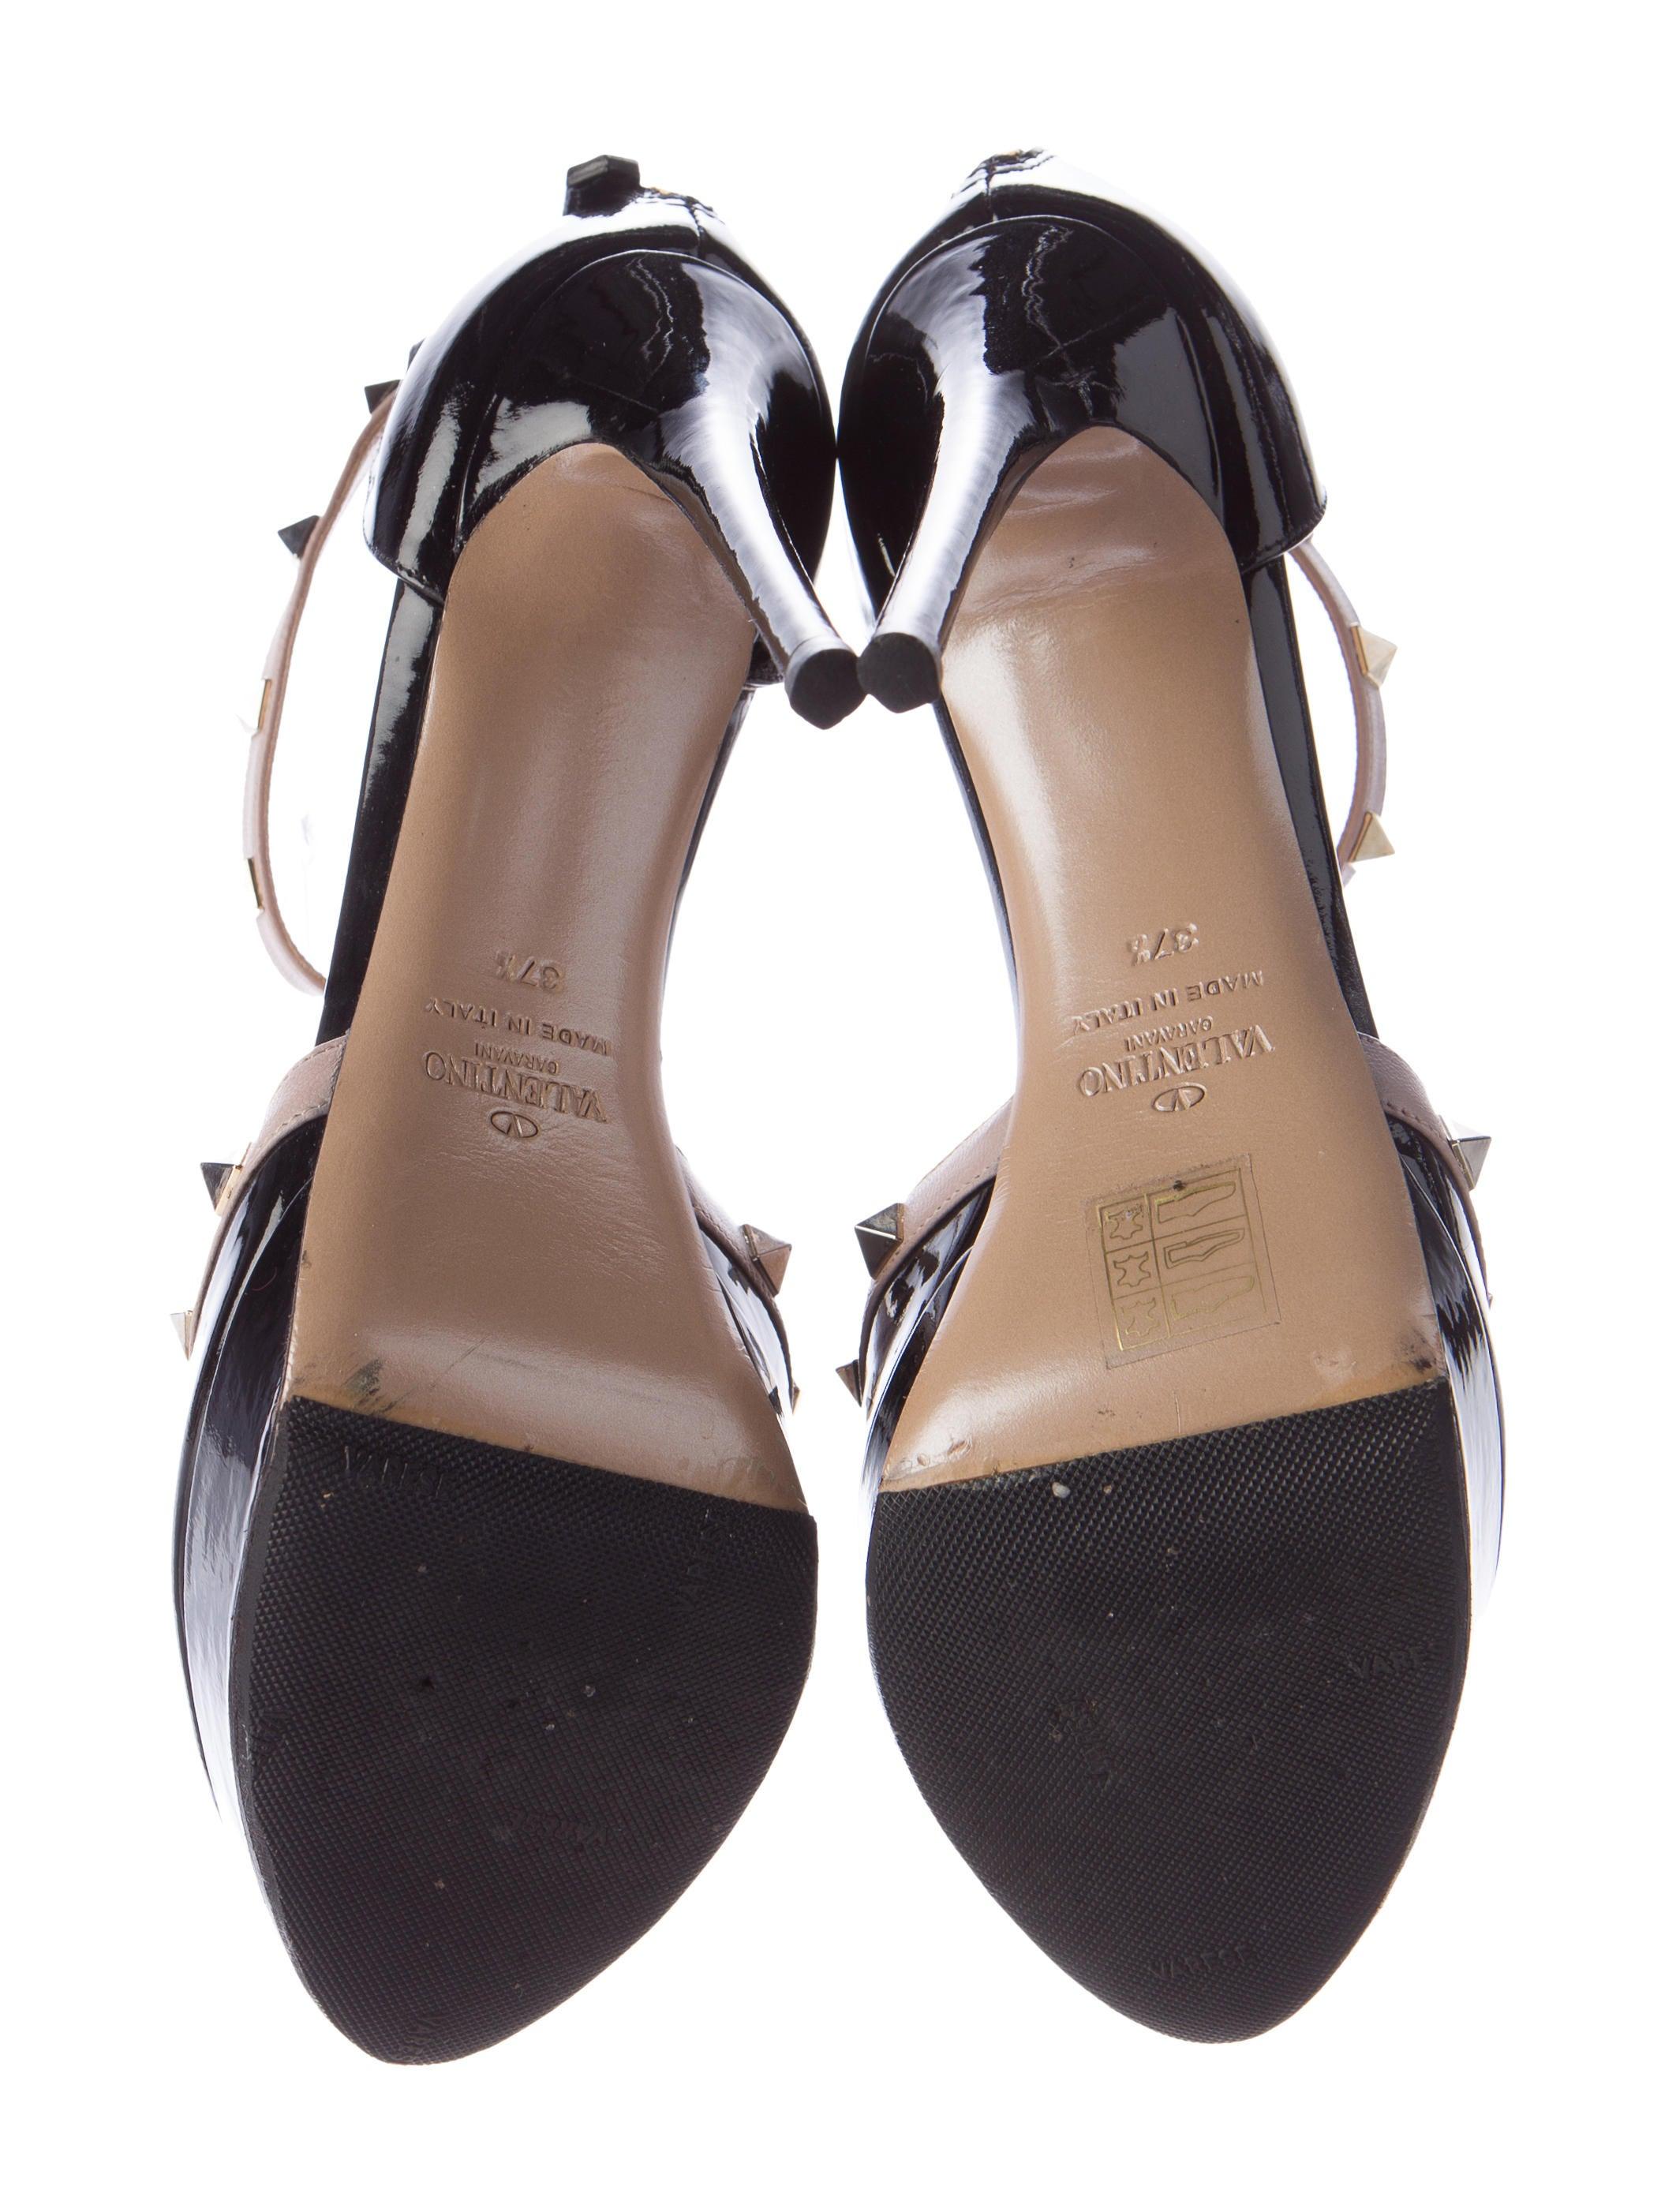 valentino rockstud t strap pumps shoes val53033 the realreal. Black Bedroom Furniture Sets. Home Design Ideas